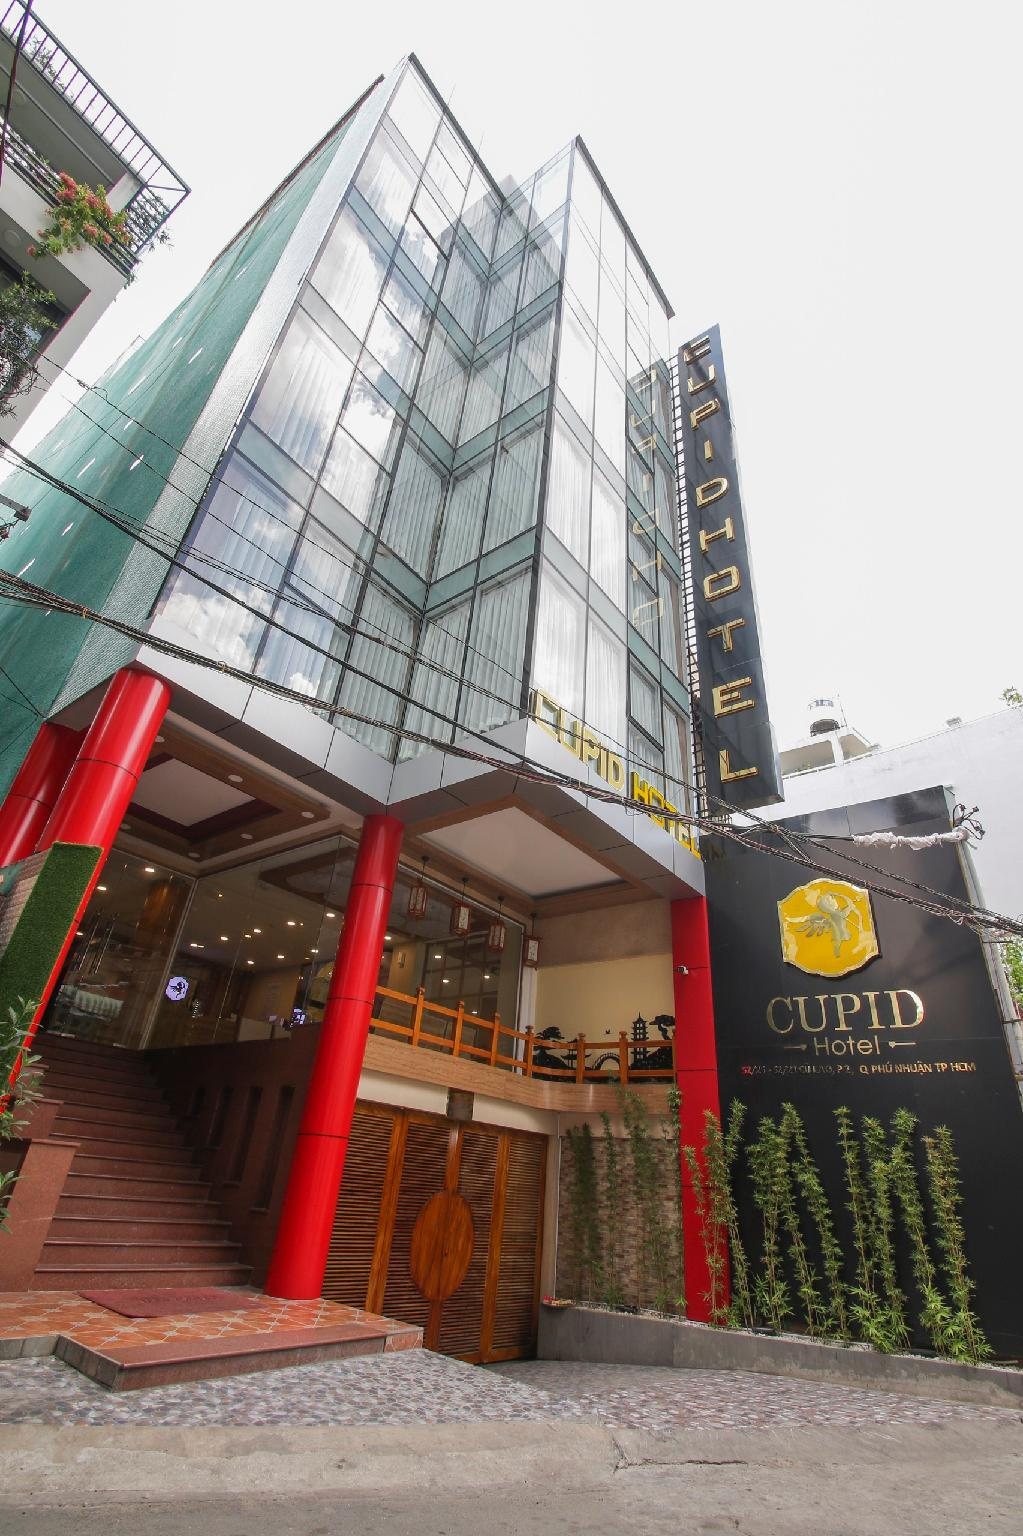 Cupid 2 Hotel